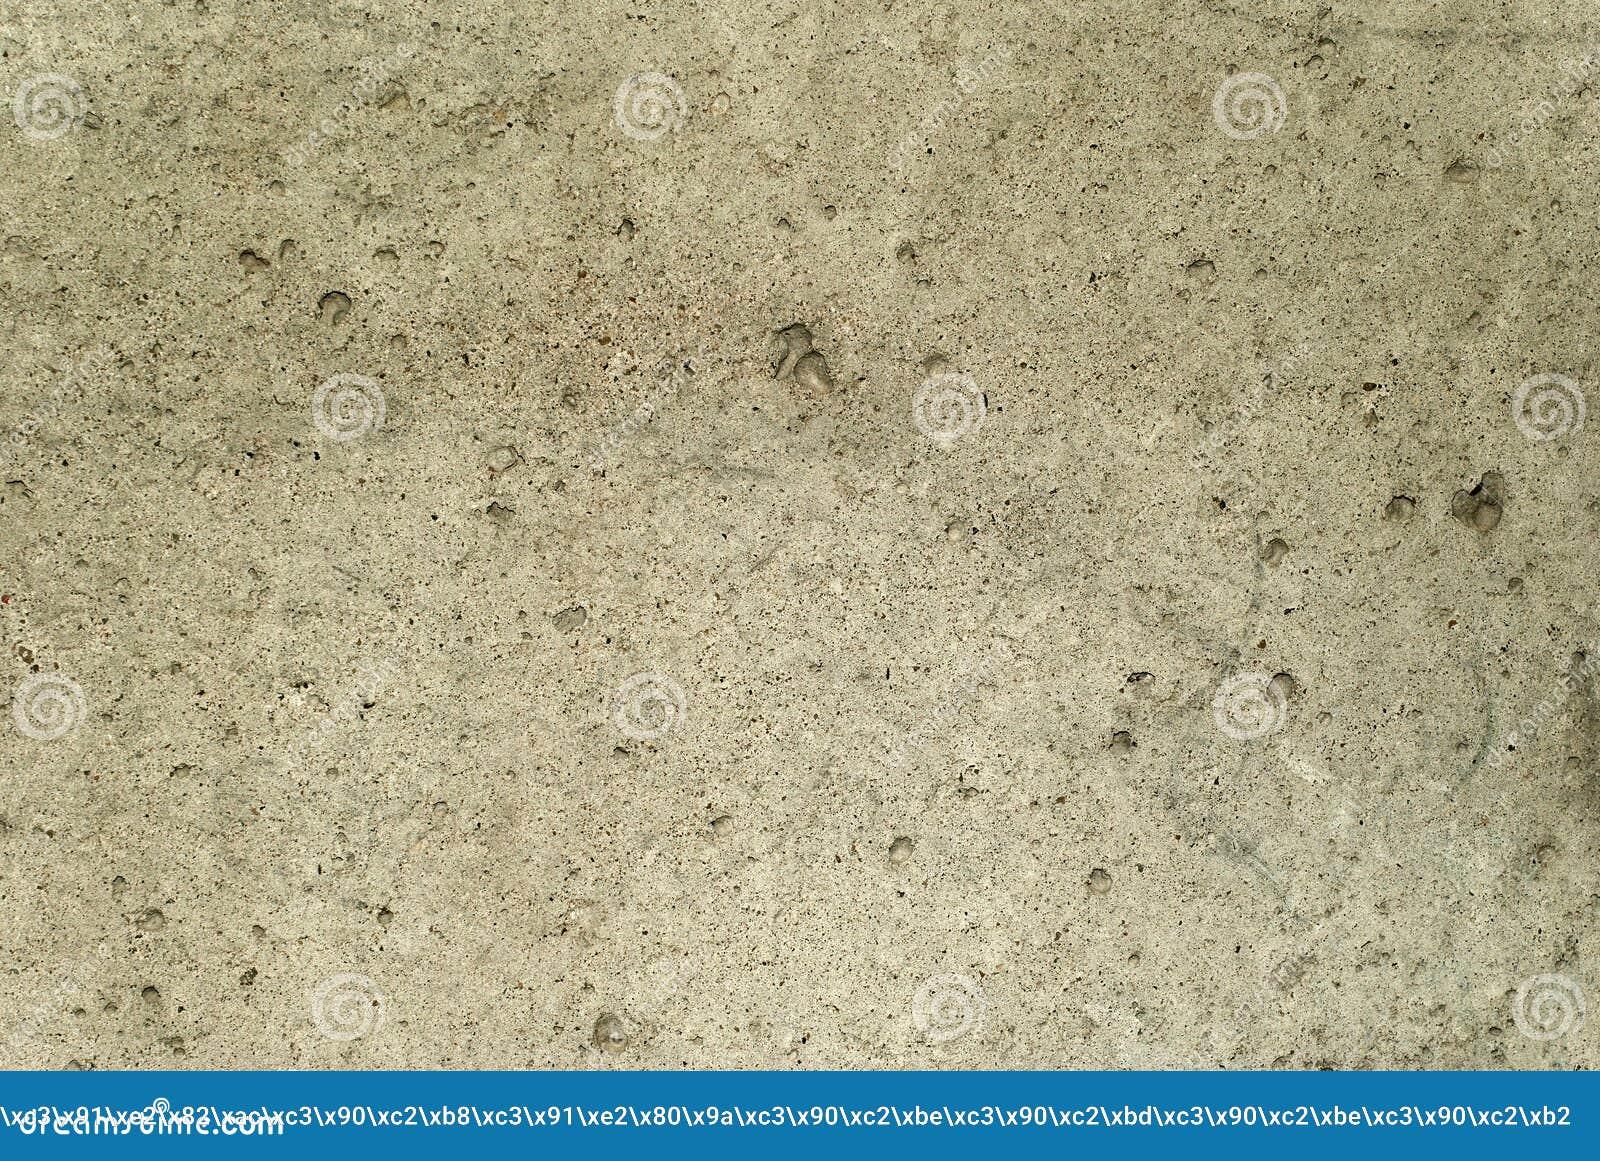 Tło, tekstura: szara betonowa powierzchnia